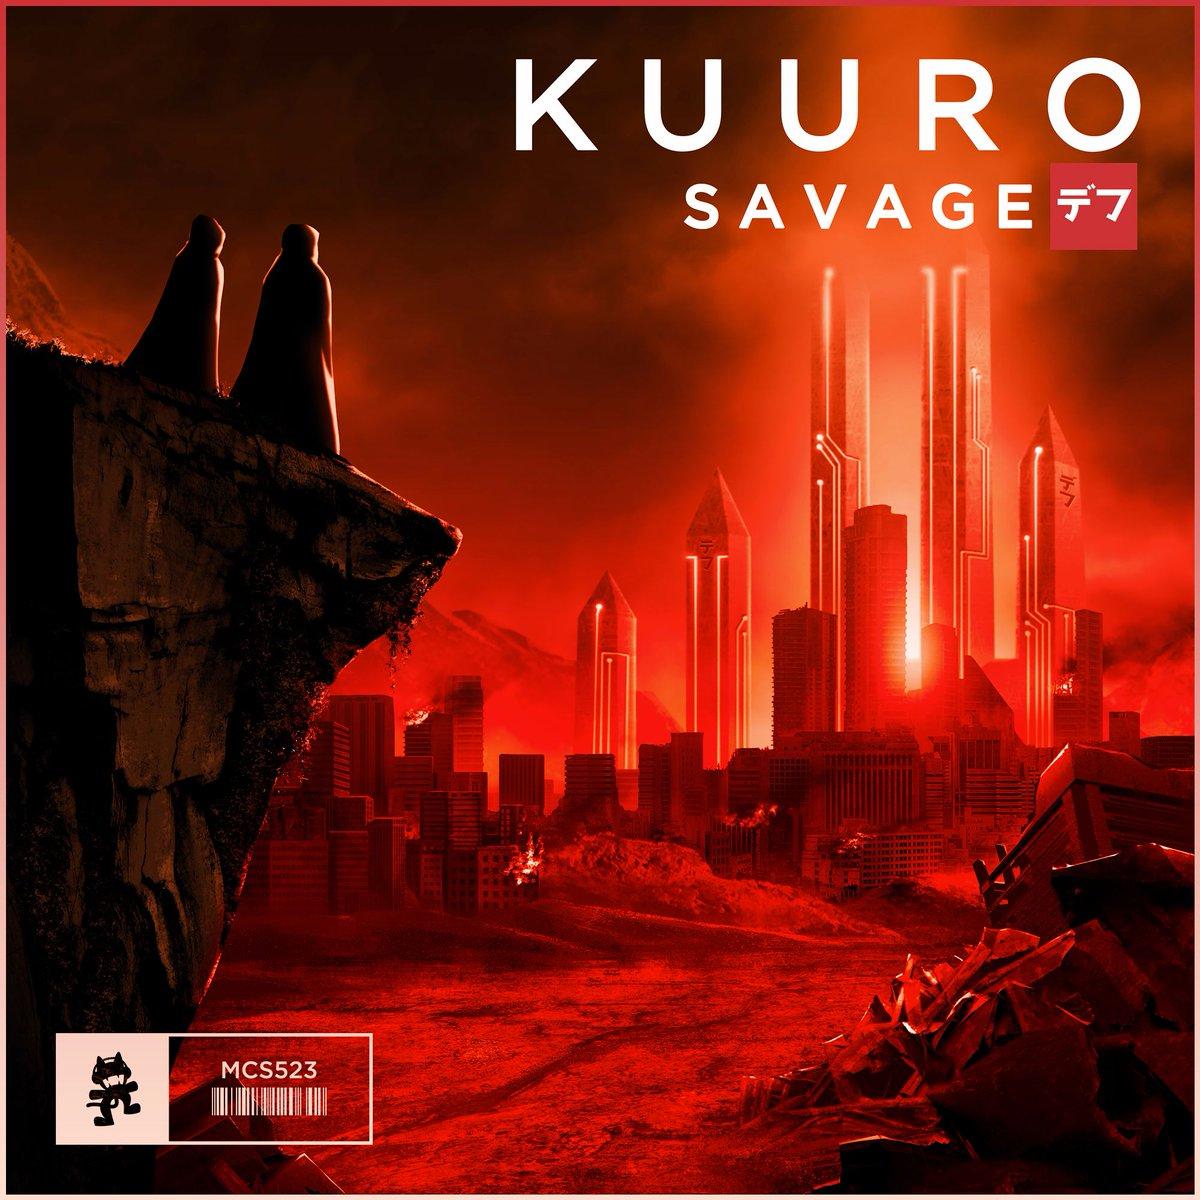 #NEWMUSIC: @kuuromusic - &#39;Savage&#39;   http:// miml.co/new-music/kuur o-savage/ &nbsp; … <br>http://pic.twitter.com/w54YHgLfA9